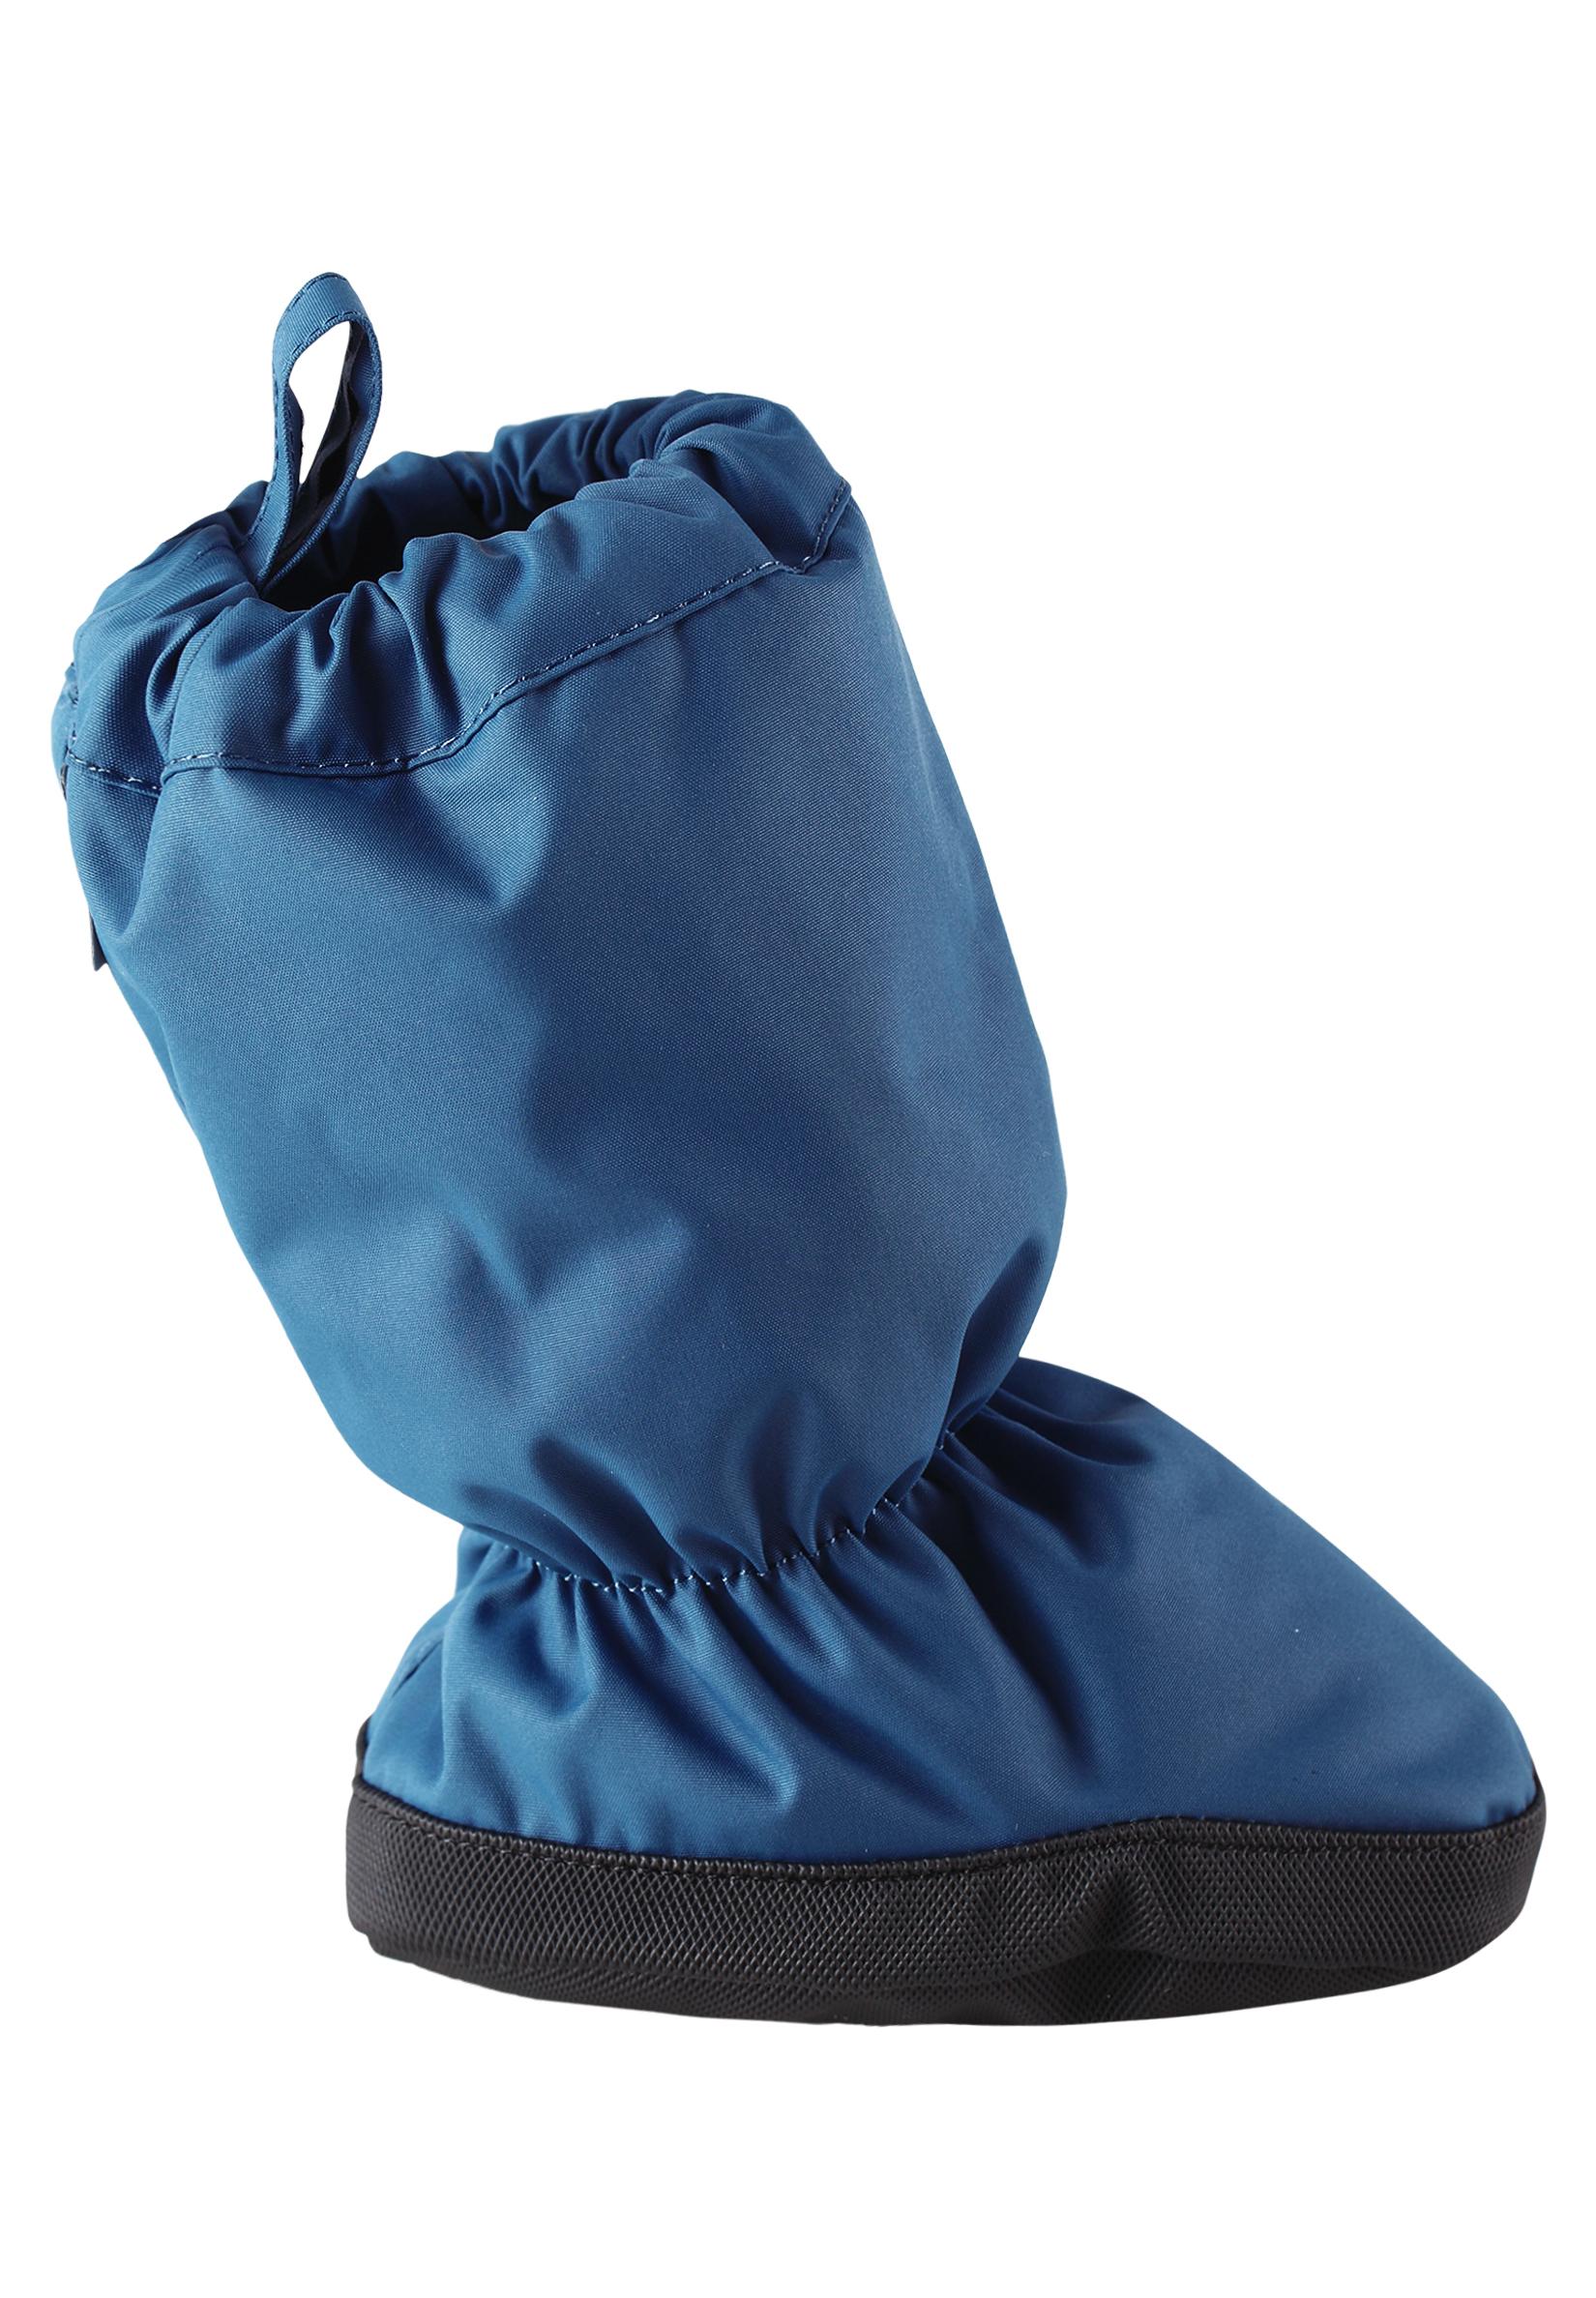 waterproof booties baby